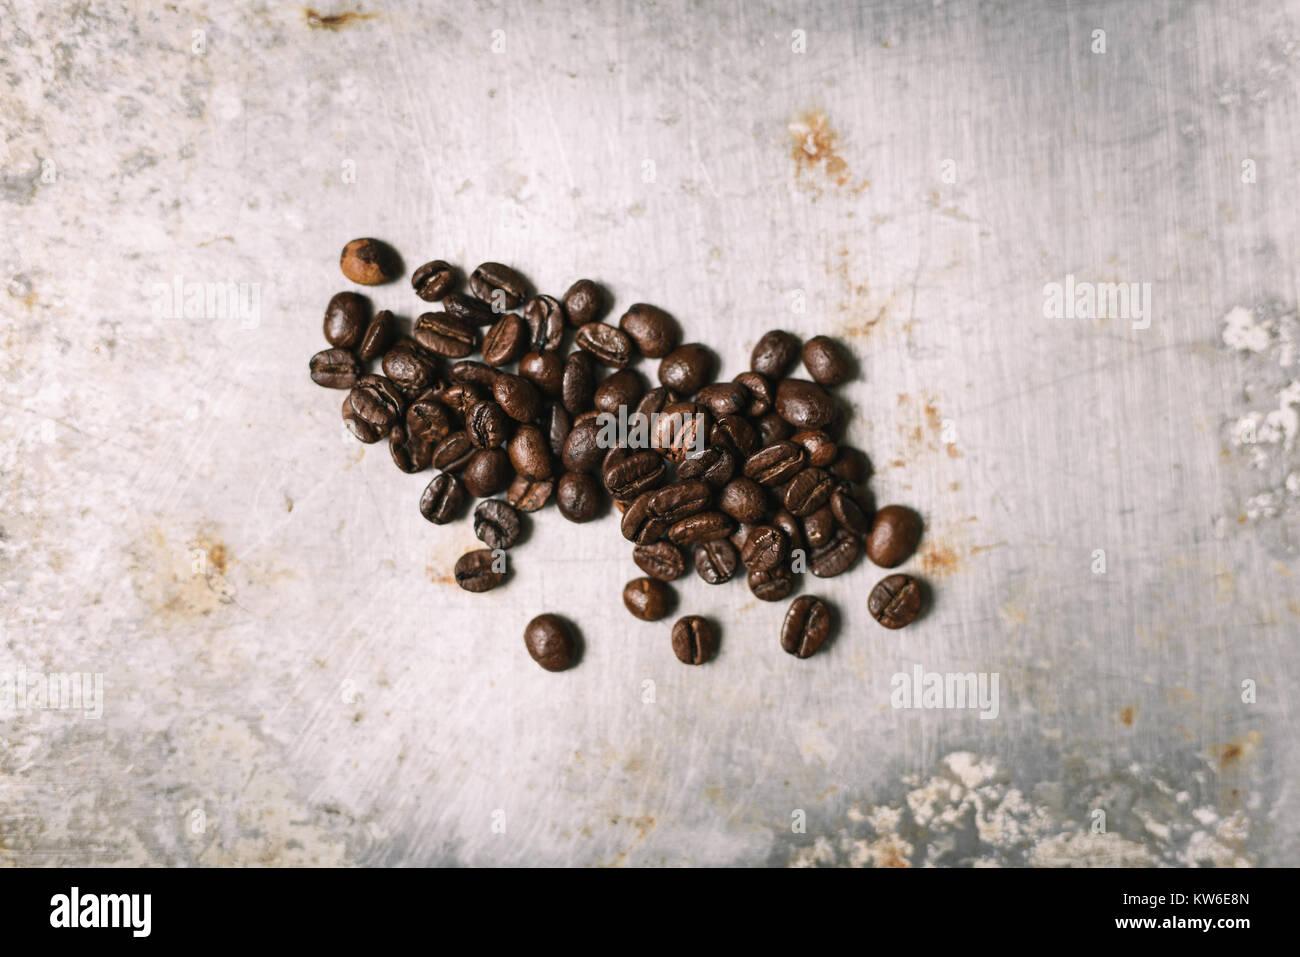 Roasted coffee bean on vintage metal surface - Stock Image